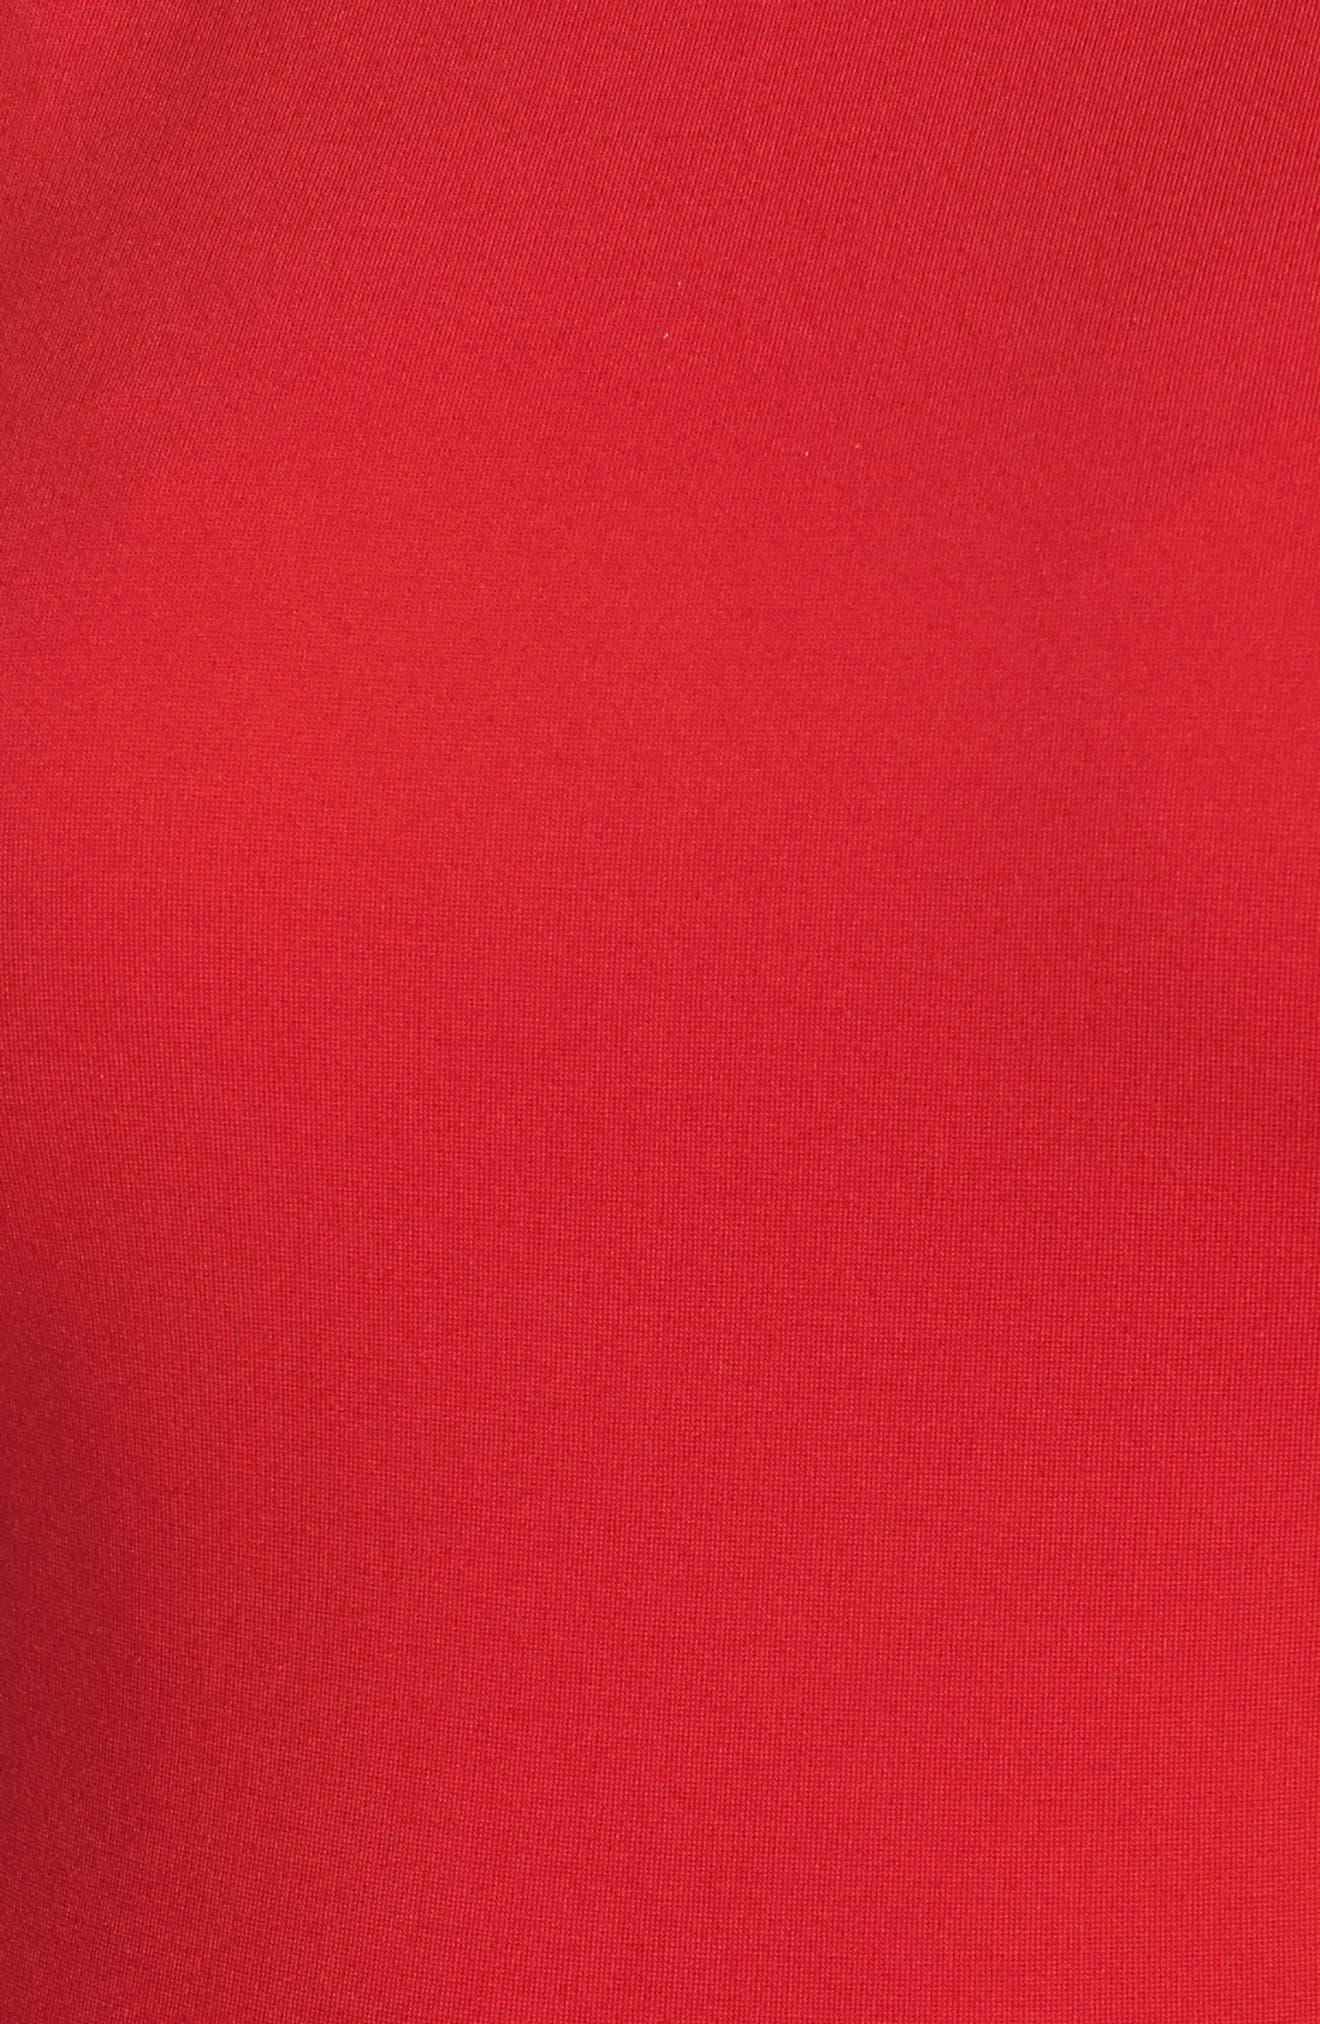 Alternate Image 5  - Felicity & Coco Rosa Fit & Flare Dress (Nordstrom Exclusive) (Regular & Petite)